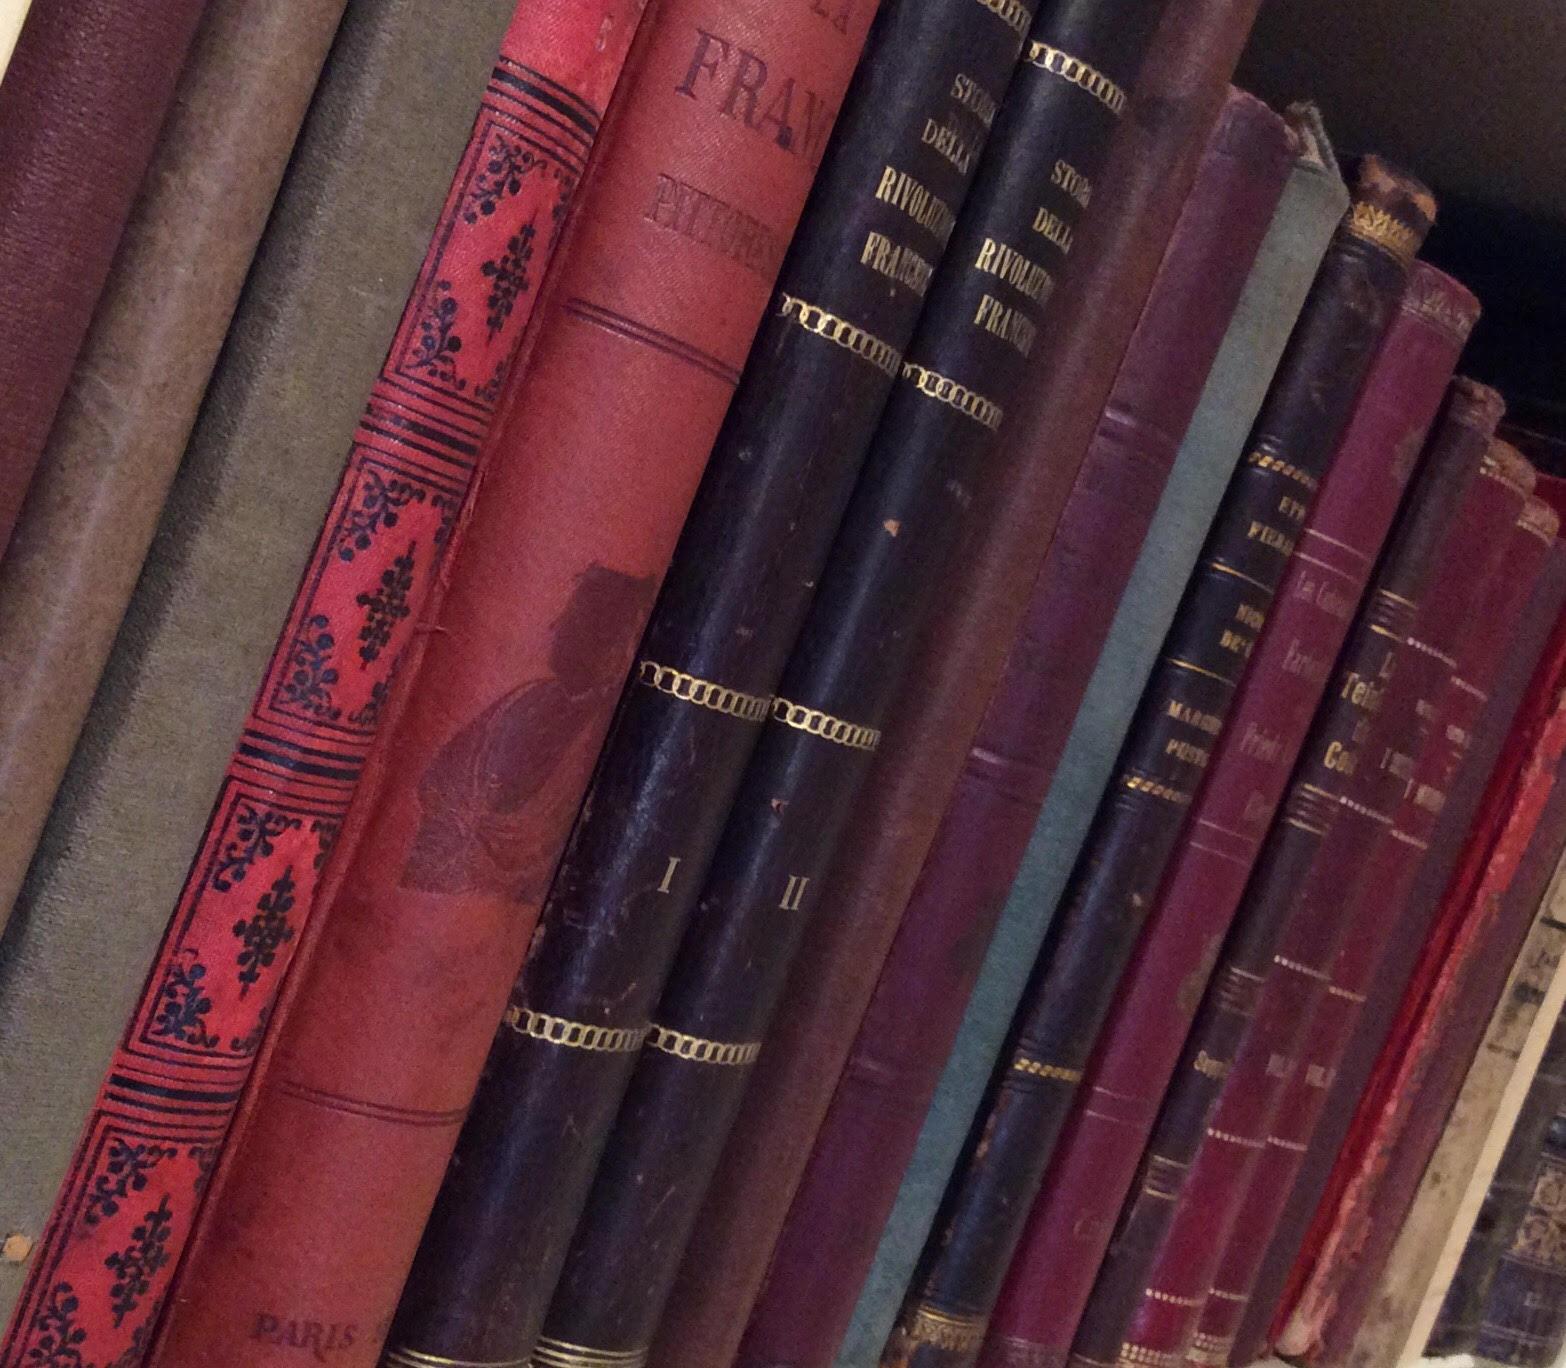 libri - A book journey